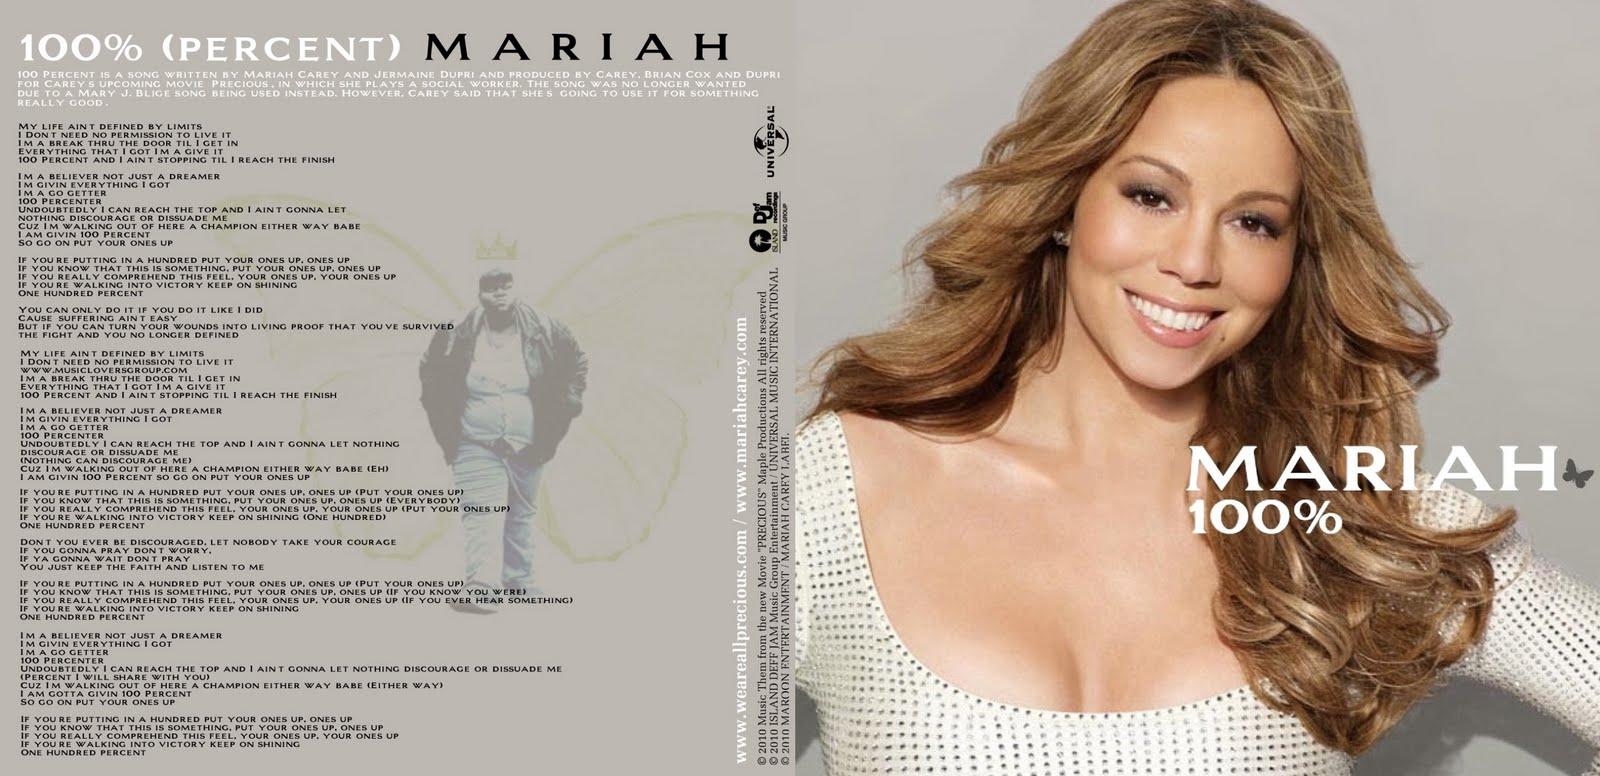 http://4.bp.blogspot.com/_FXxrq2X4po4/S5VlpIQkEEI/AAAAAAAAGPc/u3yVIhIOKXA/s1600/Mariah+Carey+-+100%25+(full).jpg